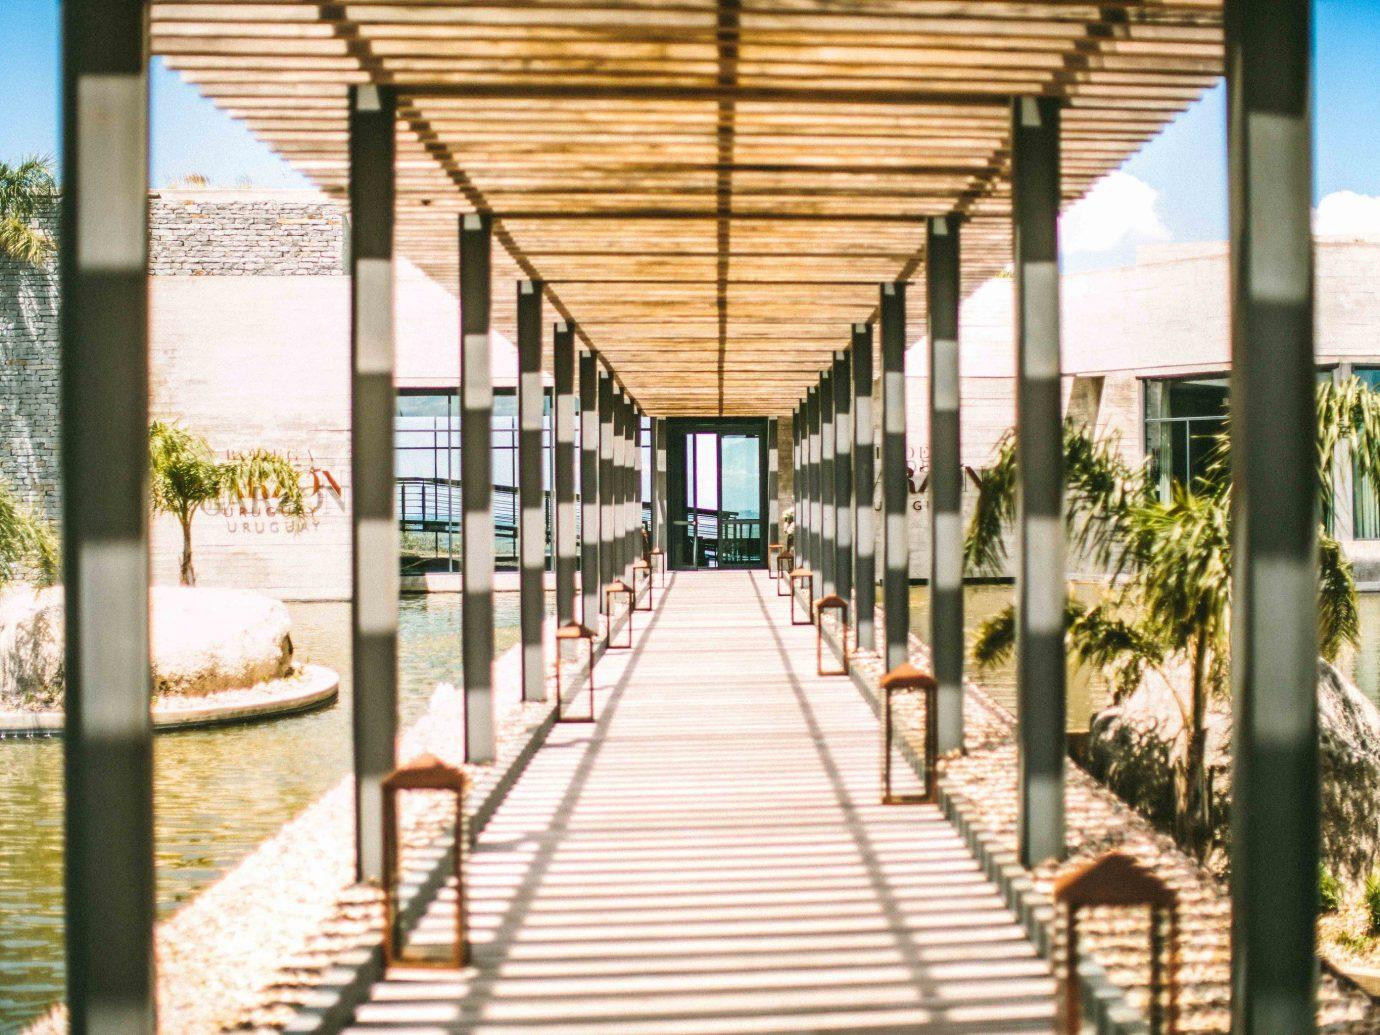 Beach Romantic Getaways south america Trip Ideas Uruguay real estate walkway condominium outdoor structure building house facade apartment window